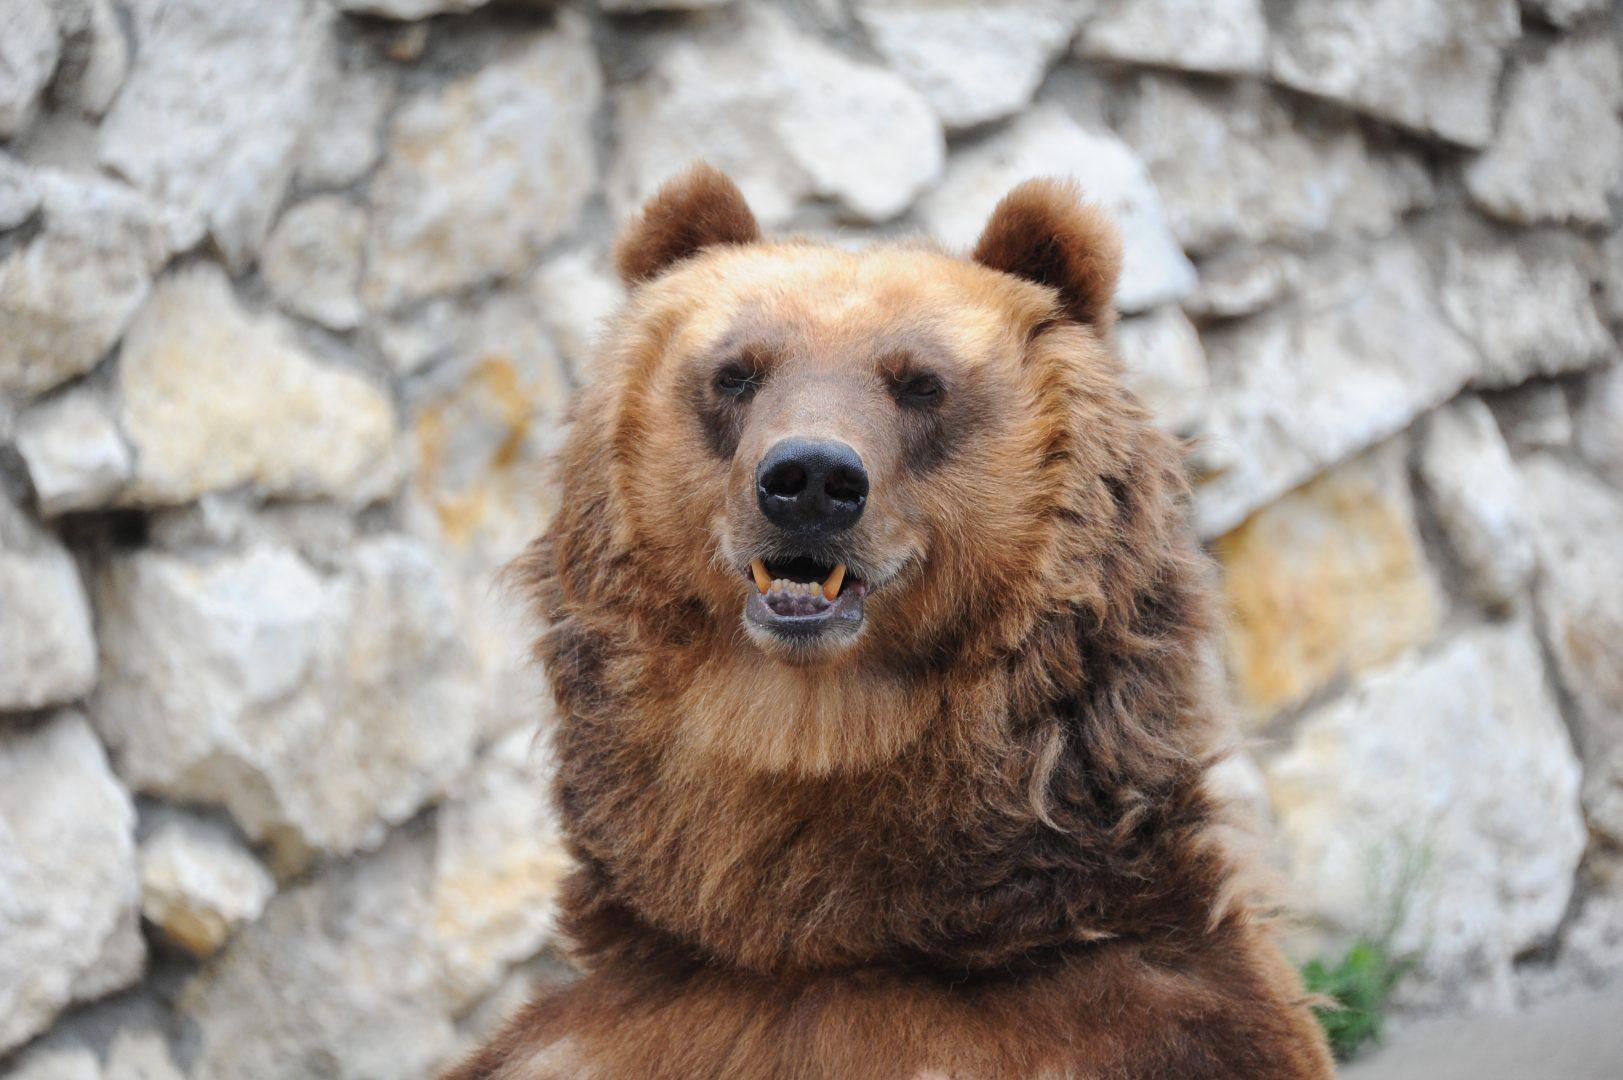 Медведи чувствуют себя хорошо. Фото: Светлана Колоскова